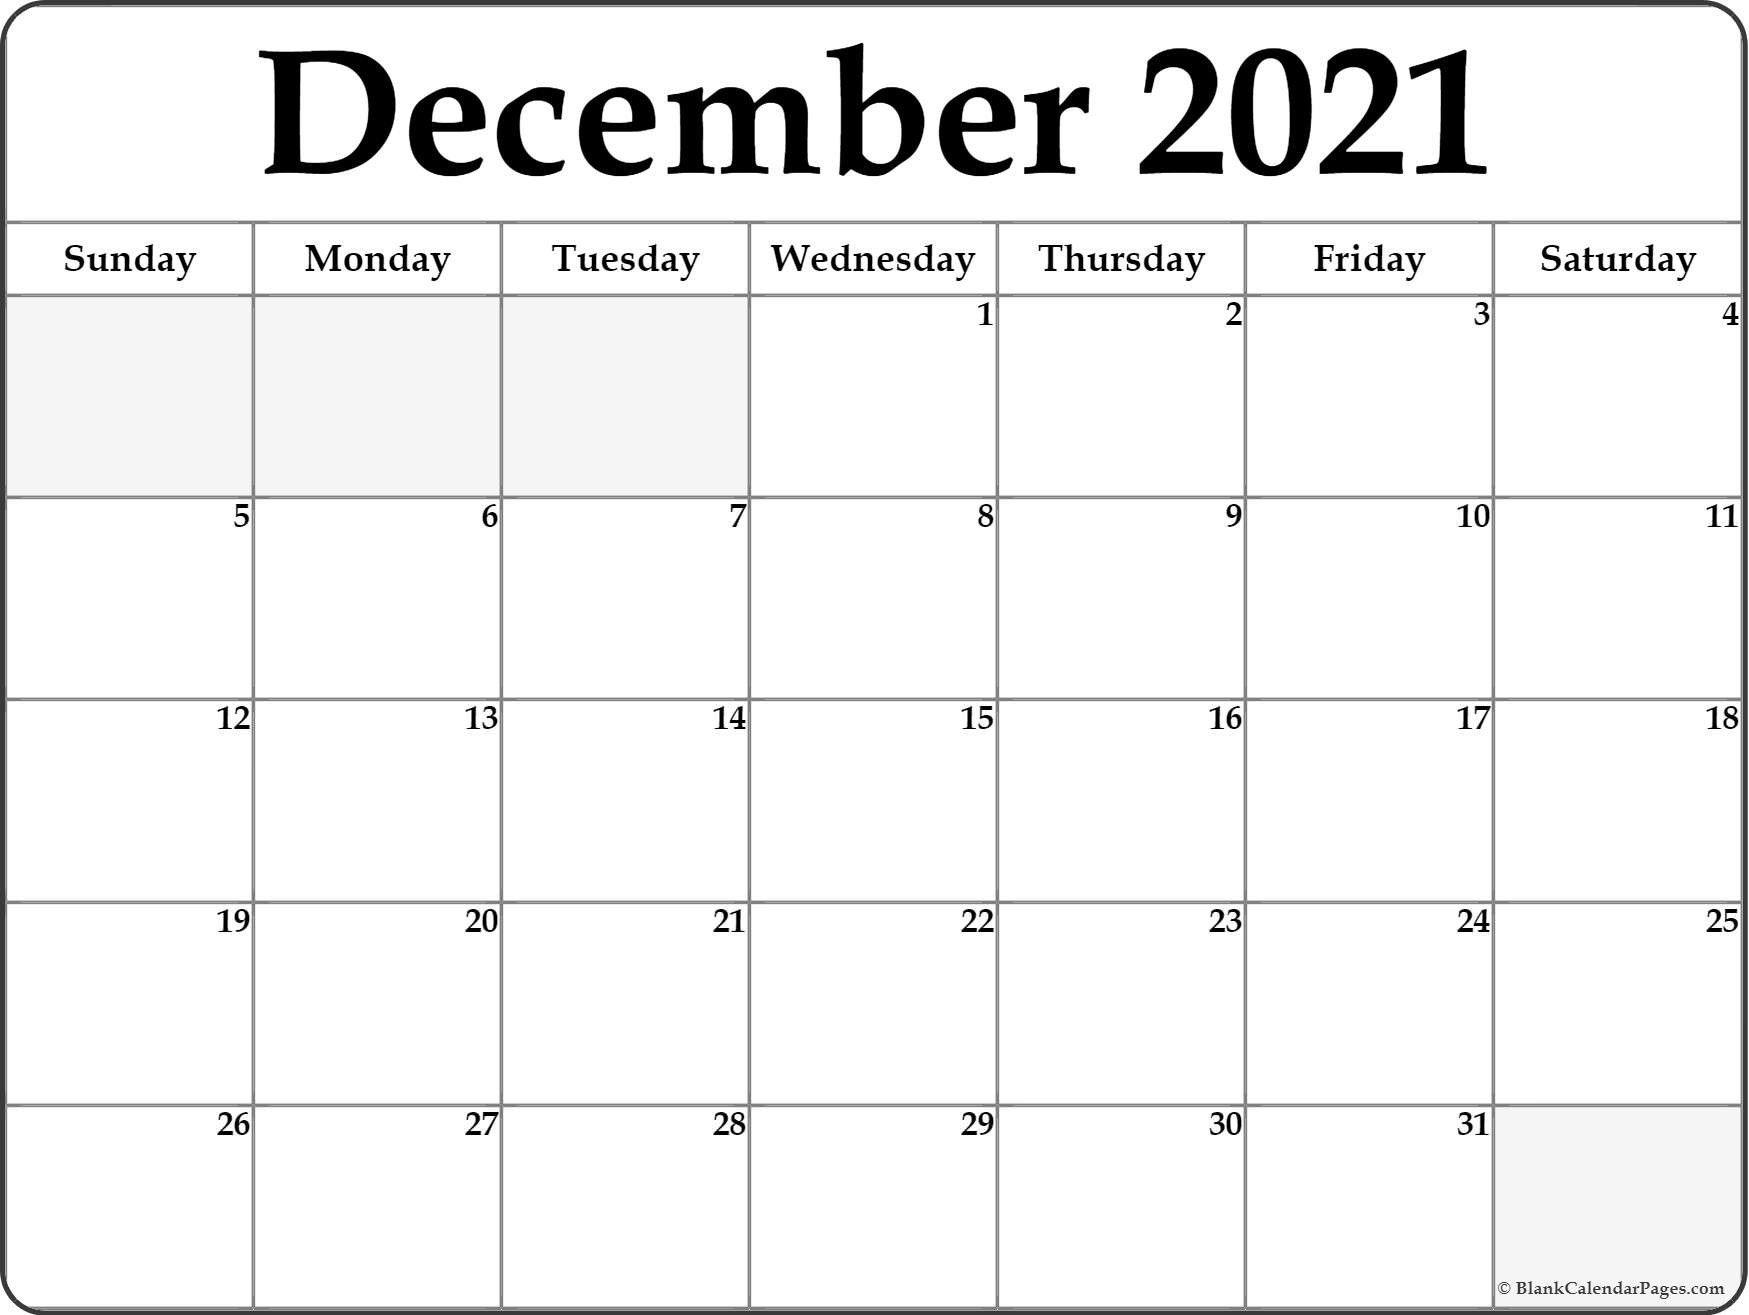 December 2021 Blank Calendar Templates December 2021 Blank